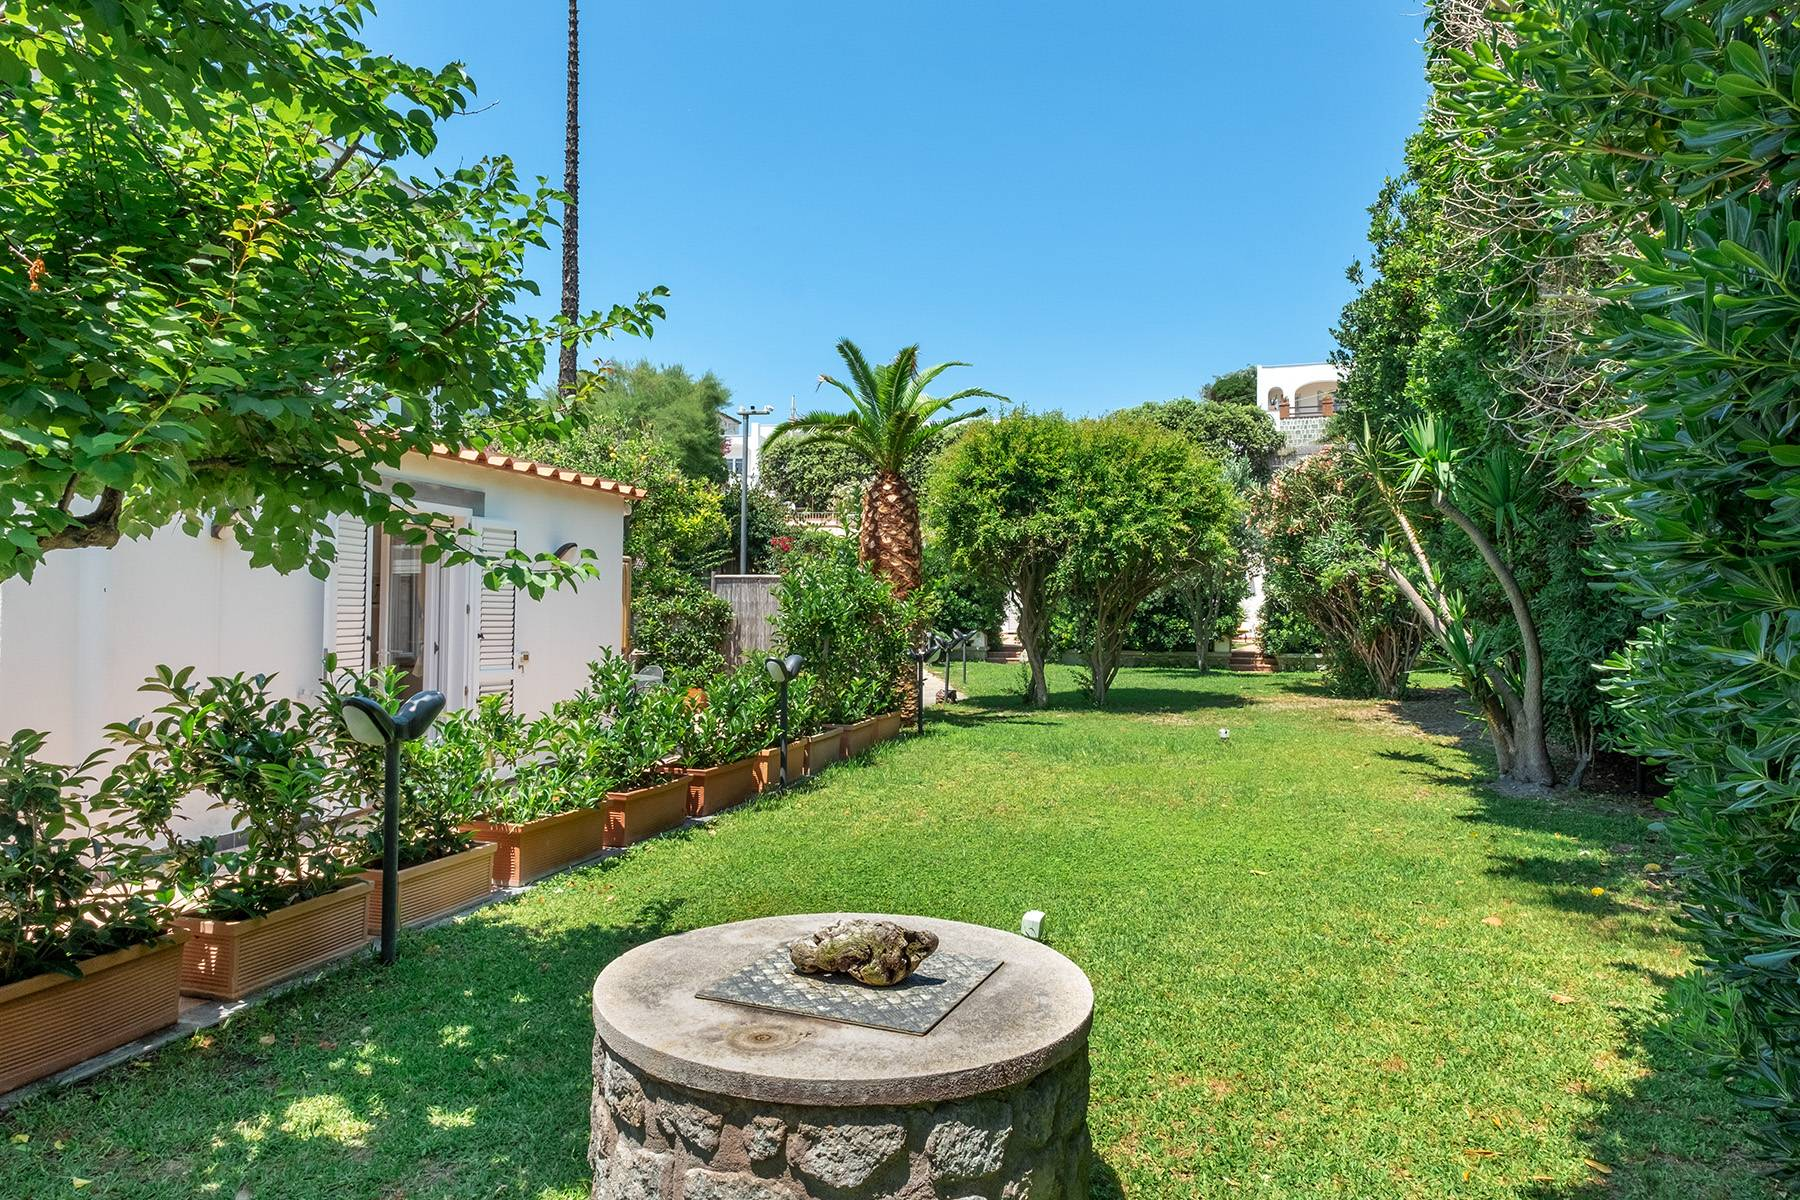 Villa in Vendita a Ischia: 5 locali, 400 mq - Foto 19